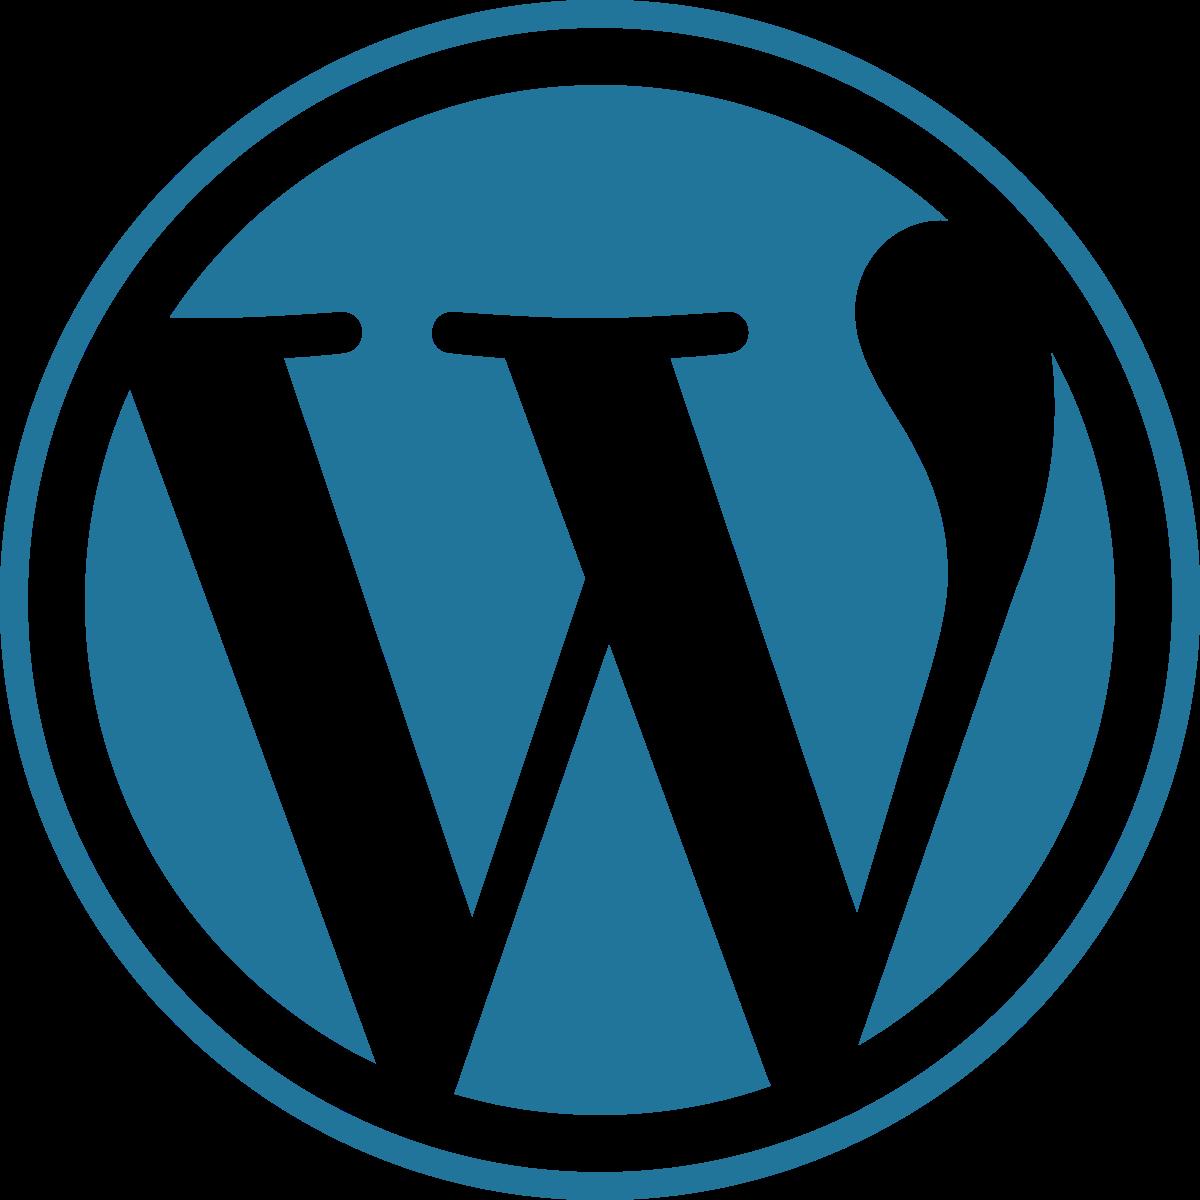 thumb_WDMyCloud_WordPress_4.7.5.png